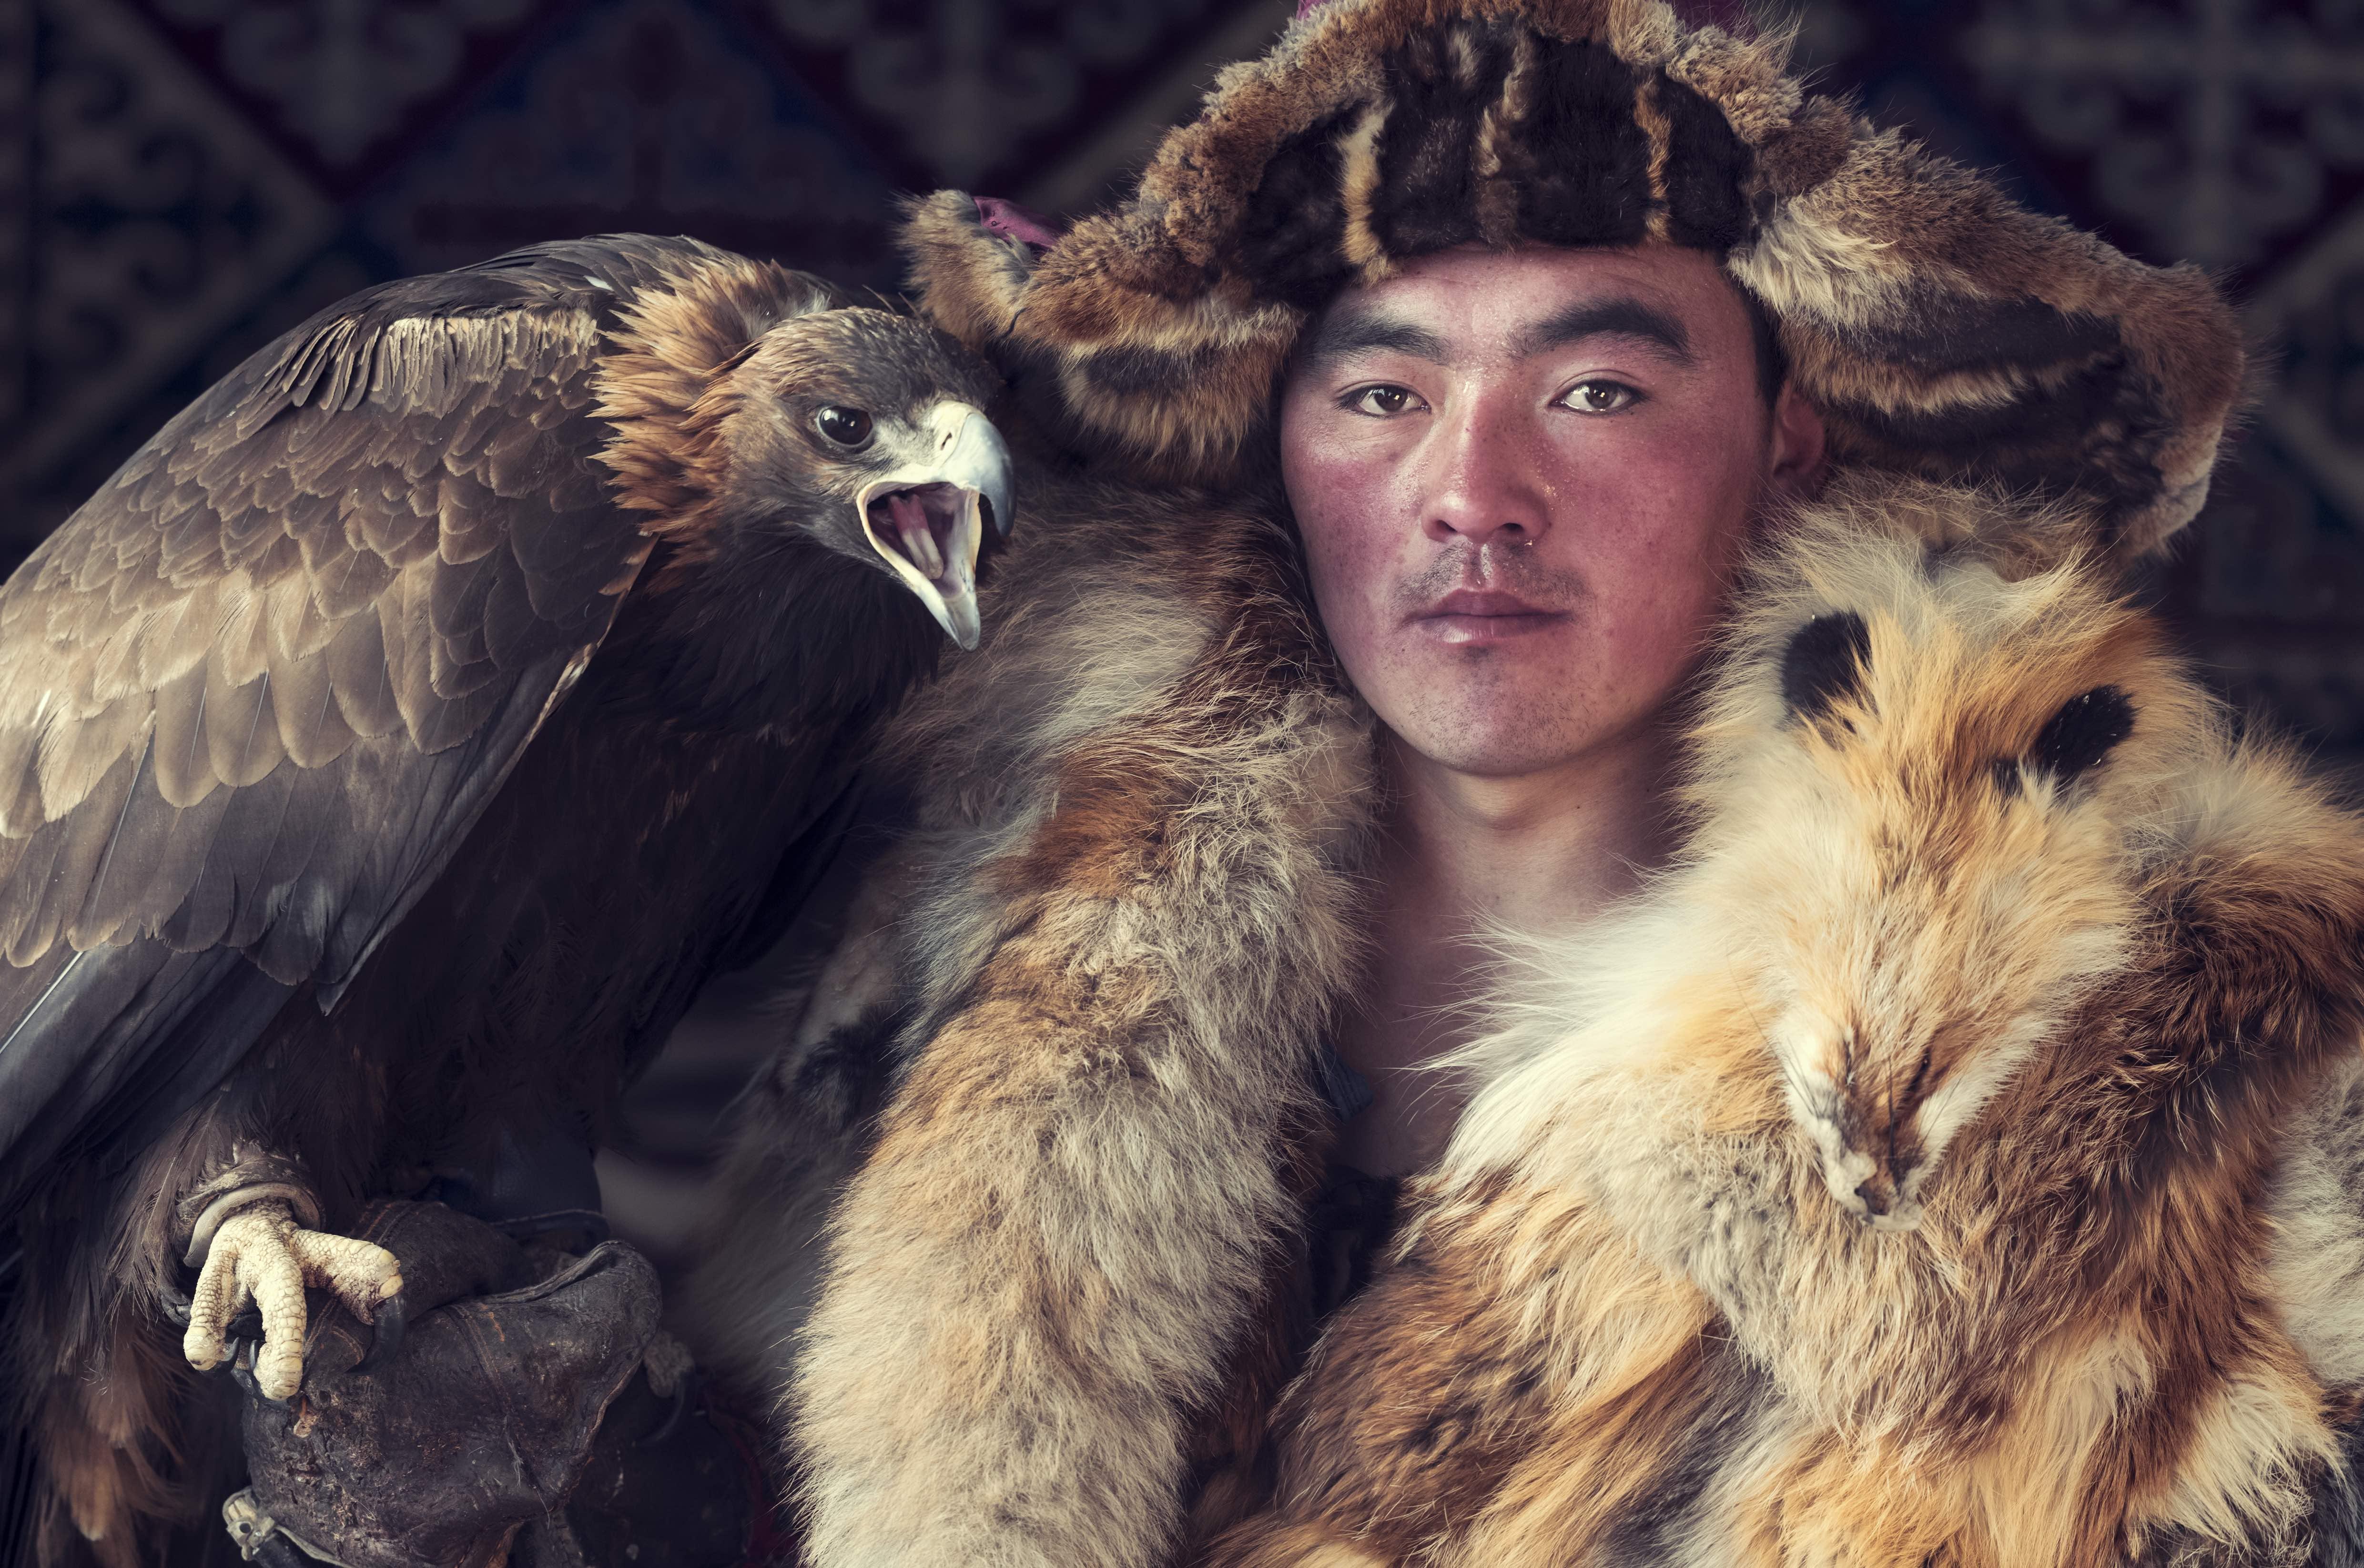 298868 xxx 17   erchebulat  kazakh   sagsai  bayan     lgii province   mongolia   2017 small a2dc50 original 1544625954